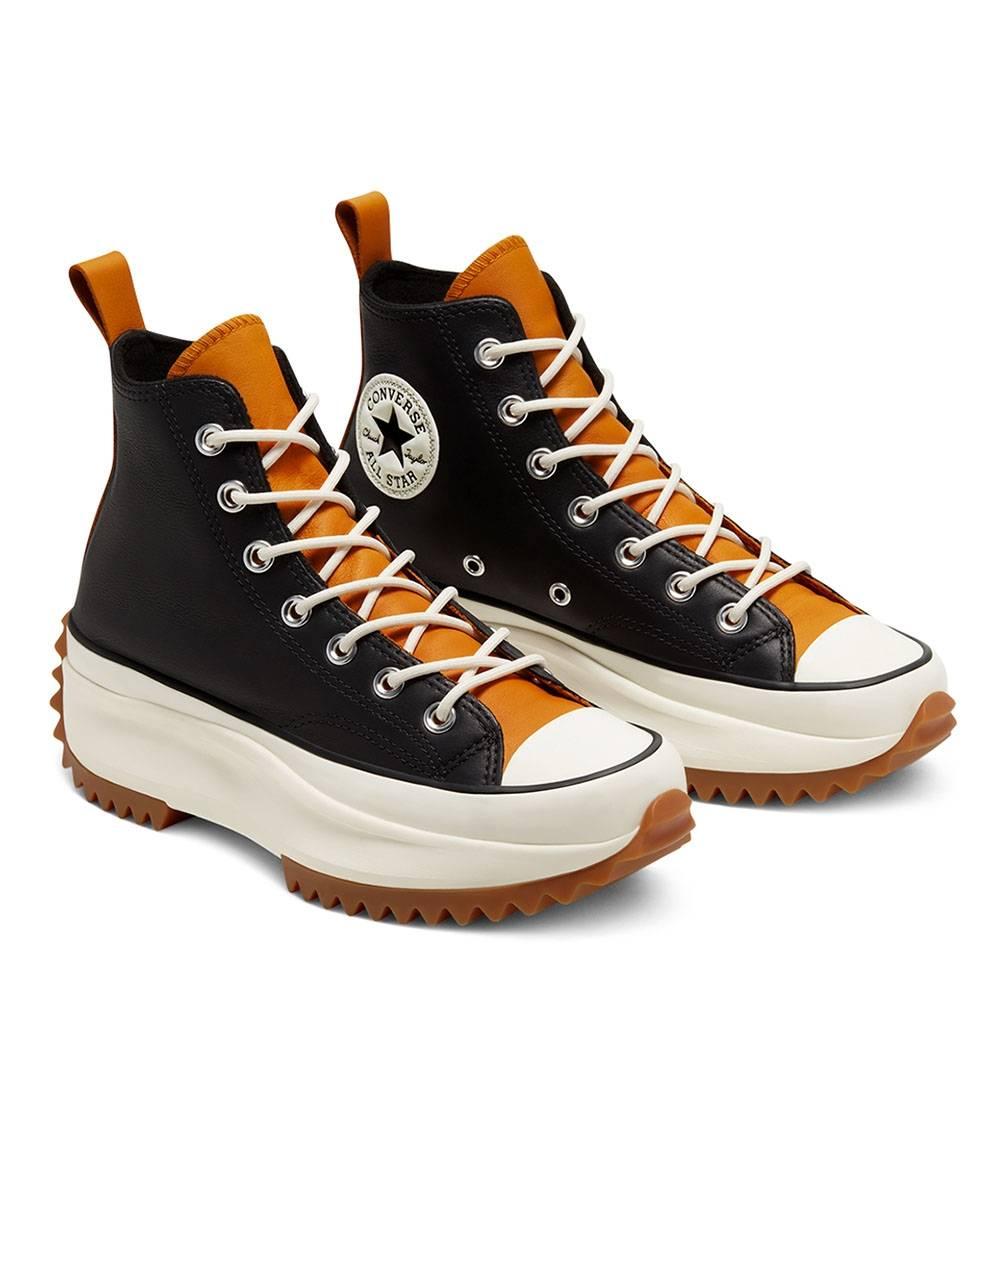 Converse Woman Run Star Hike high top - black/saffron yellow/egret Converse Sneakers 113,93€